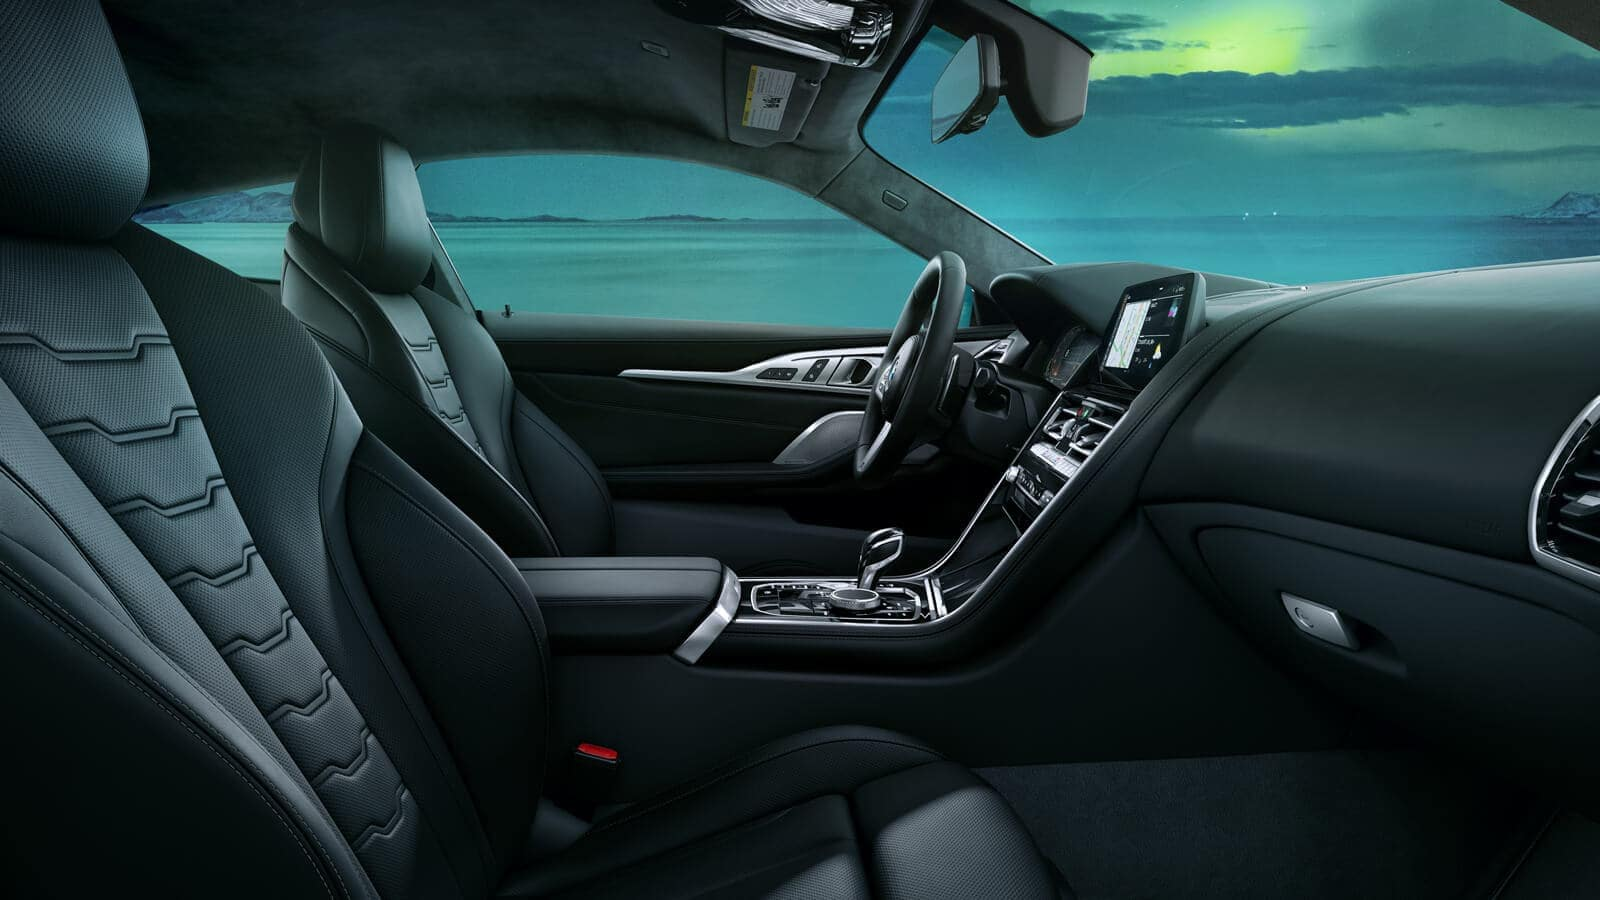 2019 BMW 8 Series passenger view